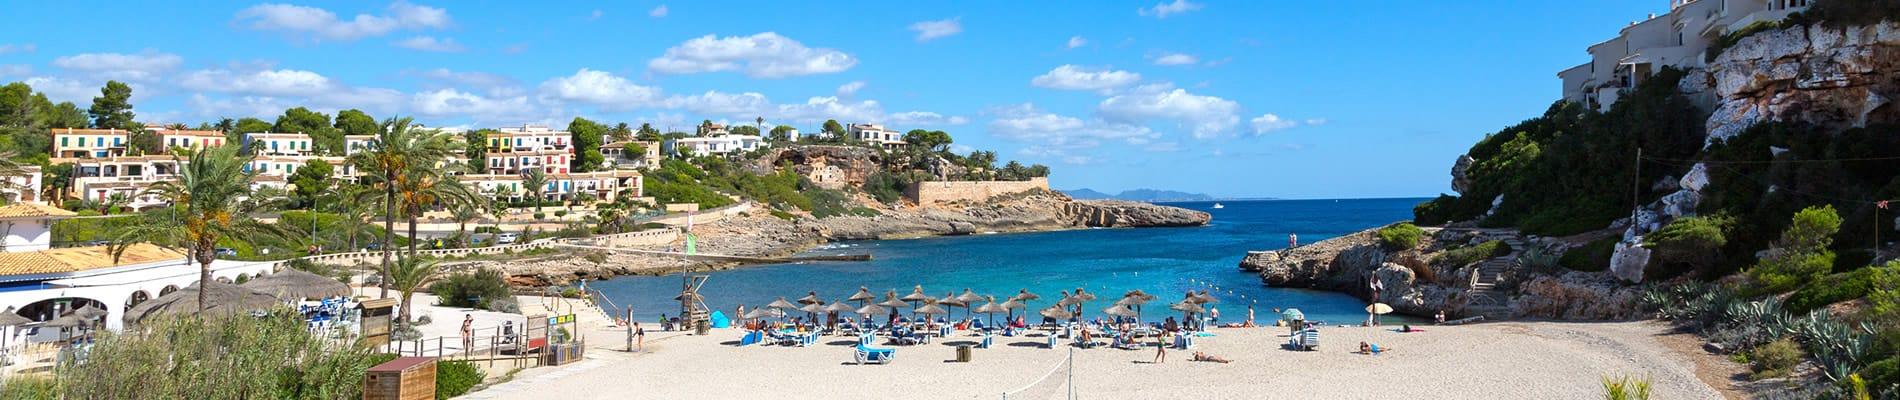 Cala Murada - Perfect Immobilien Mallorca